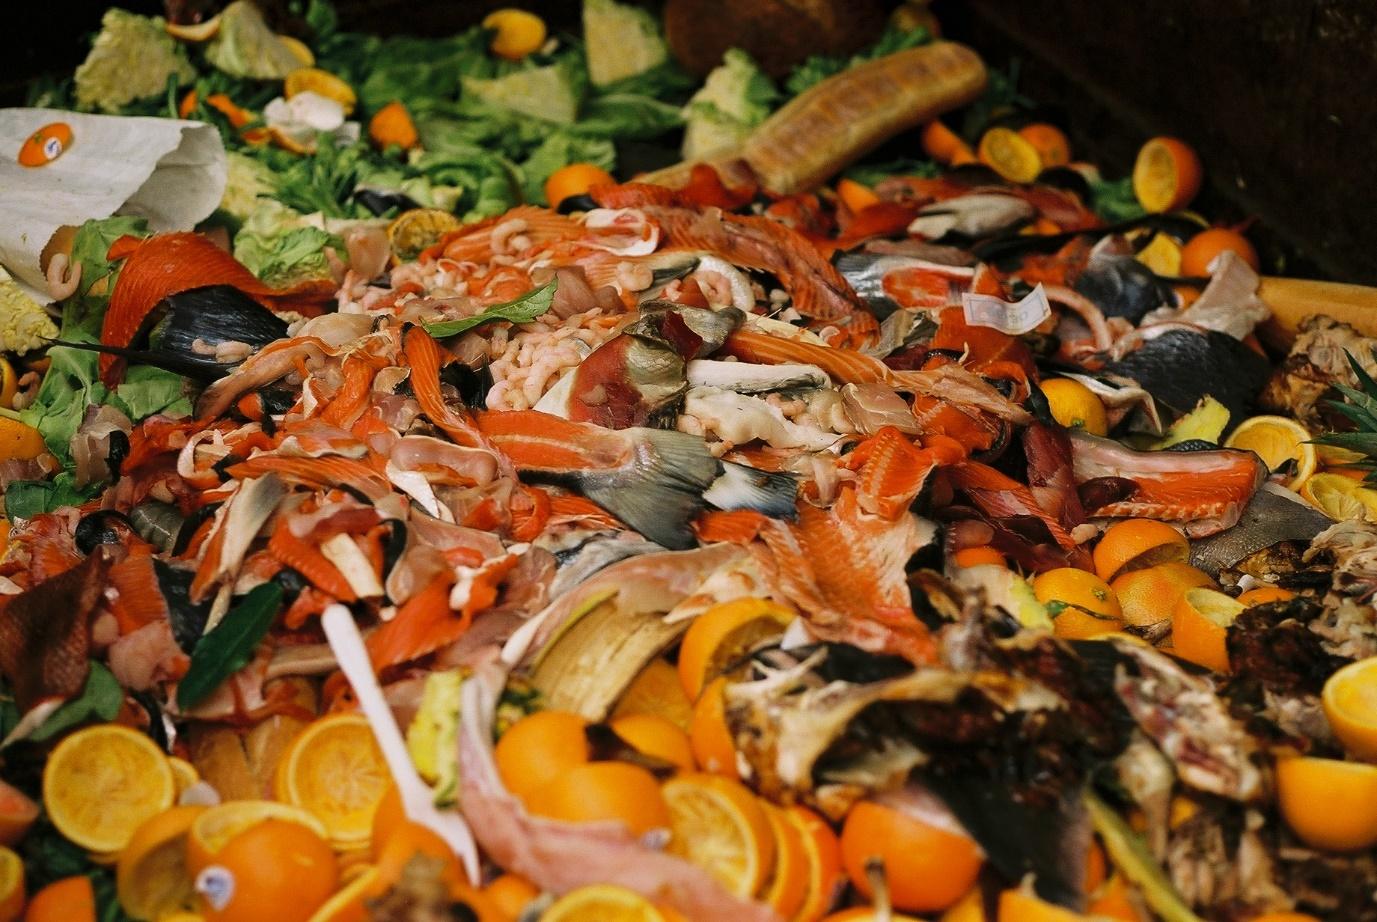 https://upload.wikimedia.org/wikipedia/commons/3/31/GI_Market_food_waste.jpg